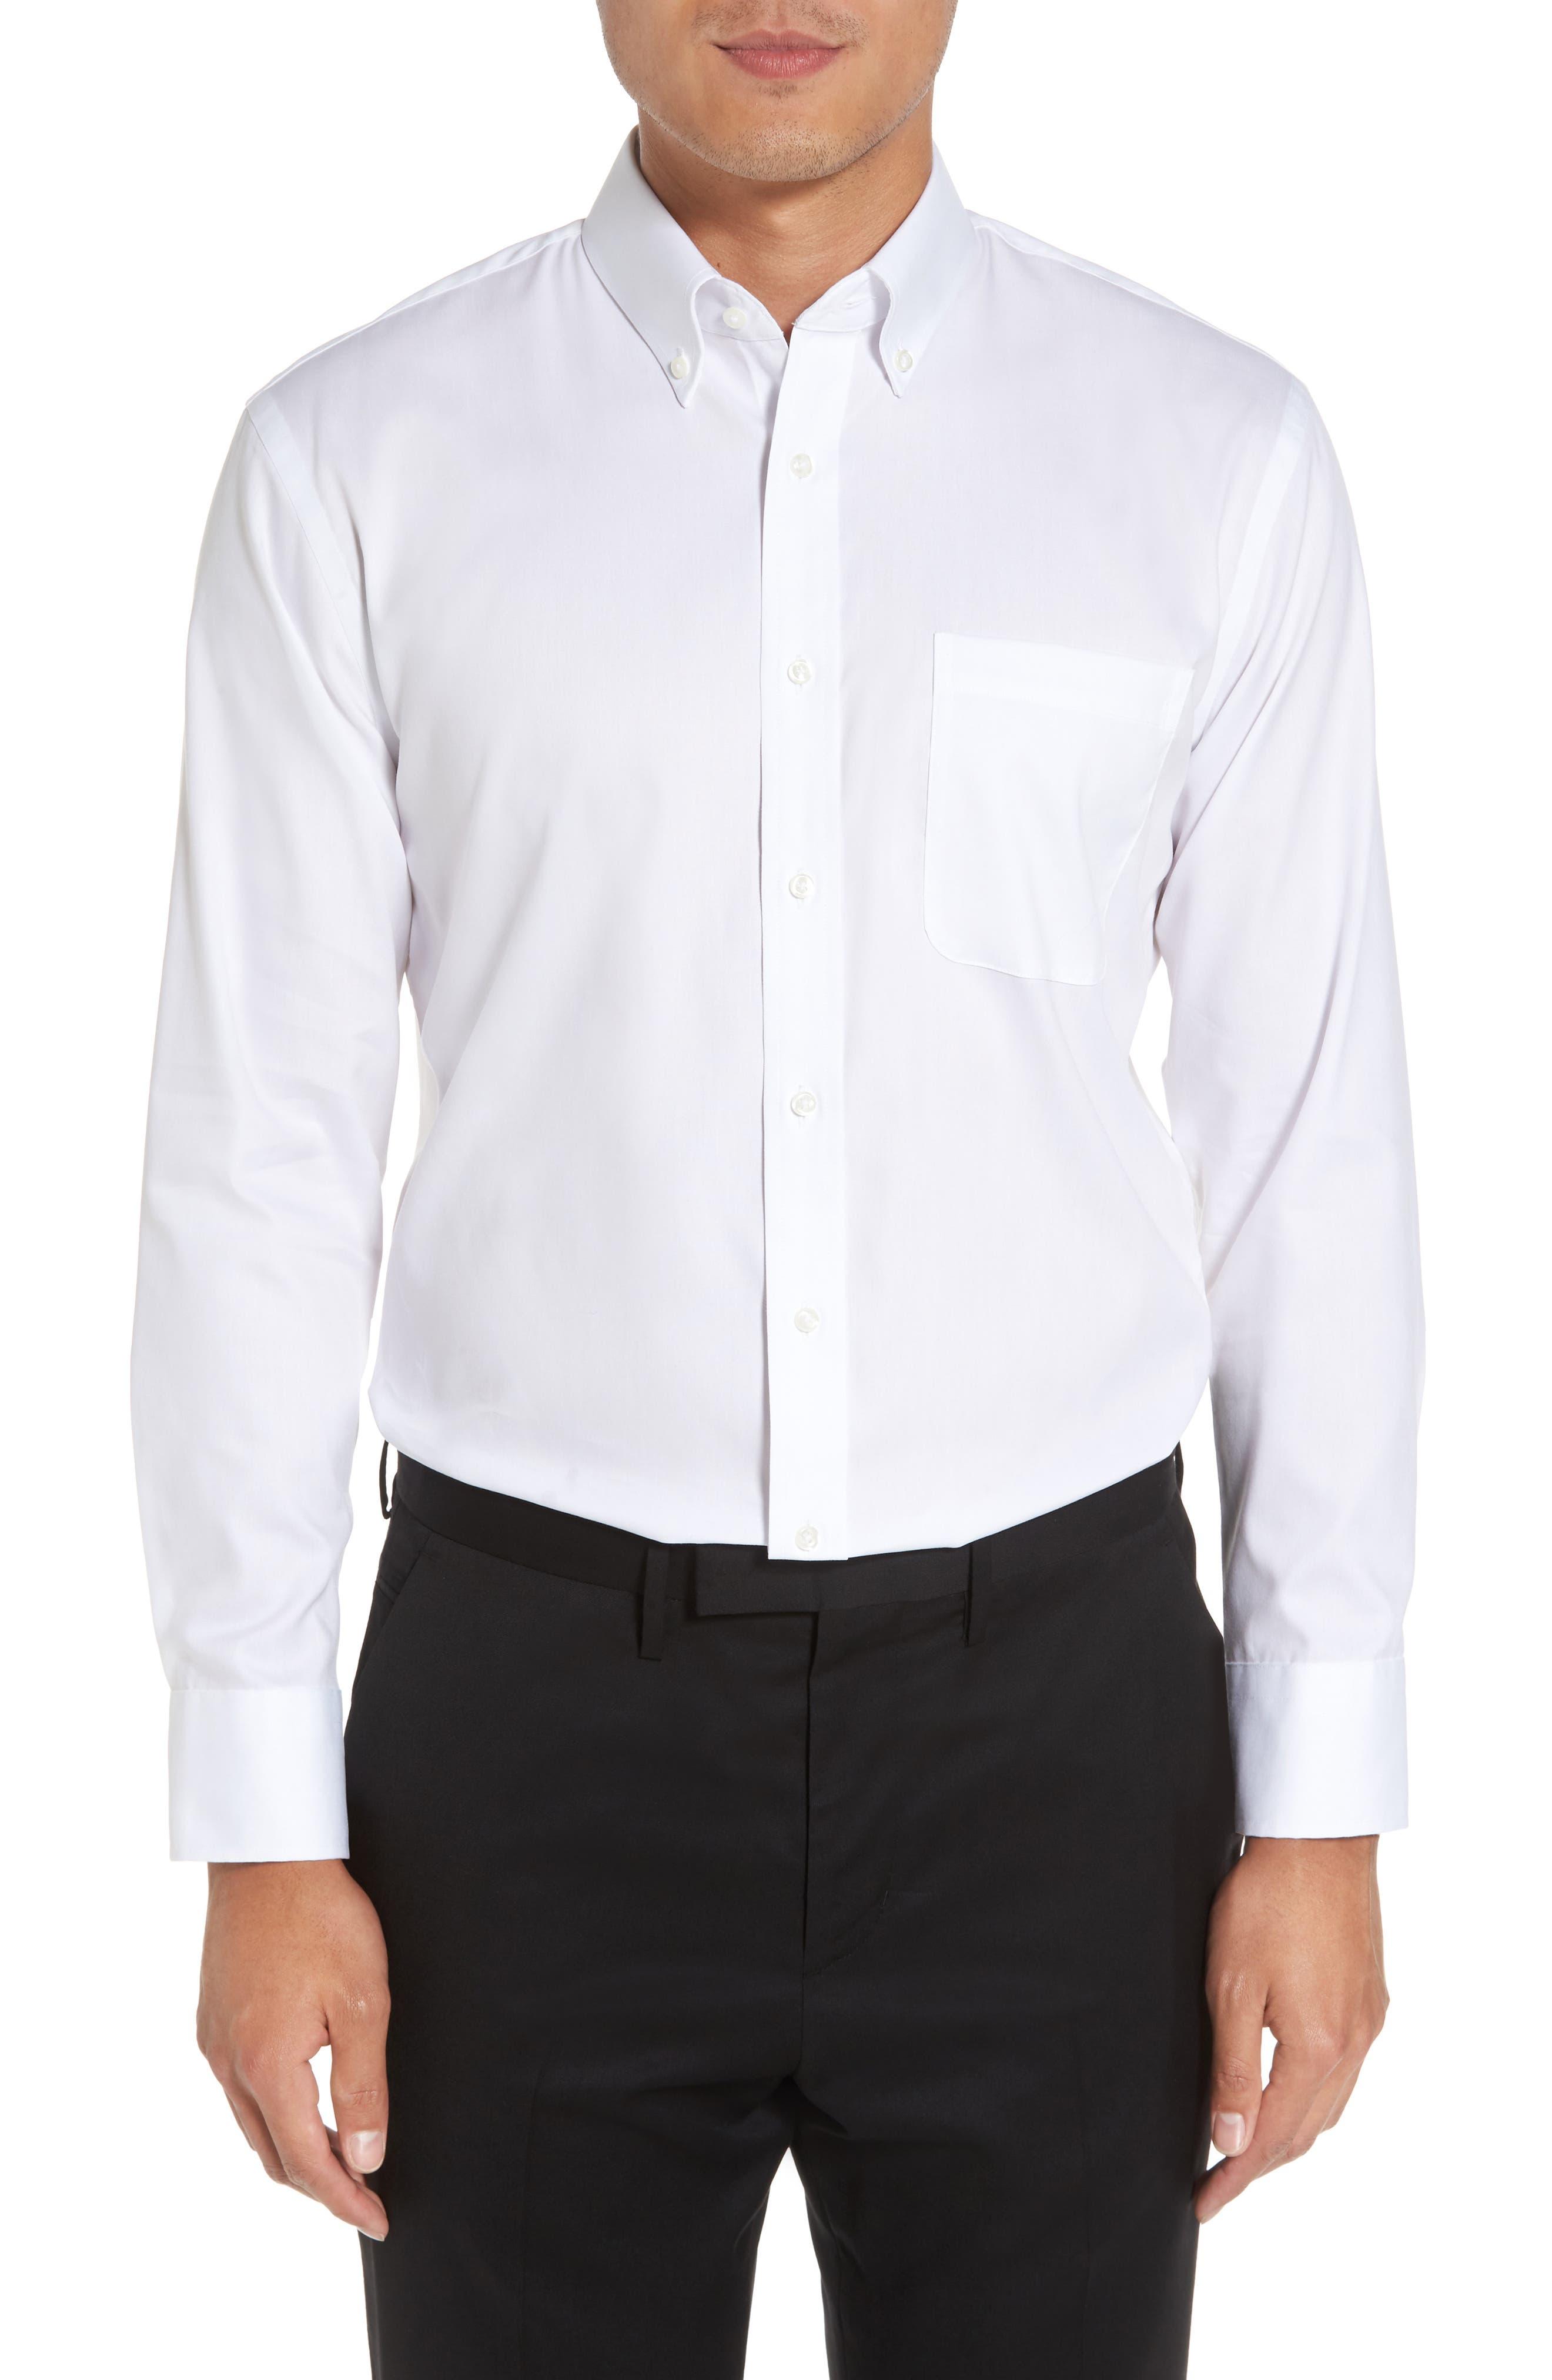 Alternate Image 1 Selected - Nordstrom Men's Shop Trim Fit Non-Iron Dress Shirt